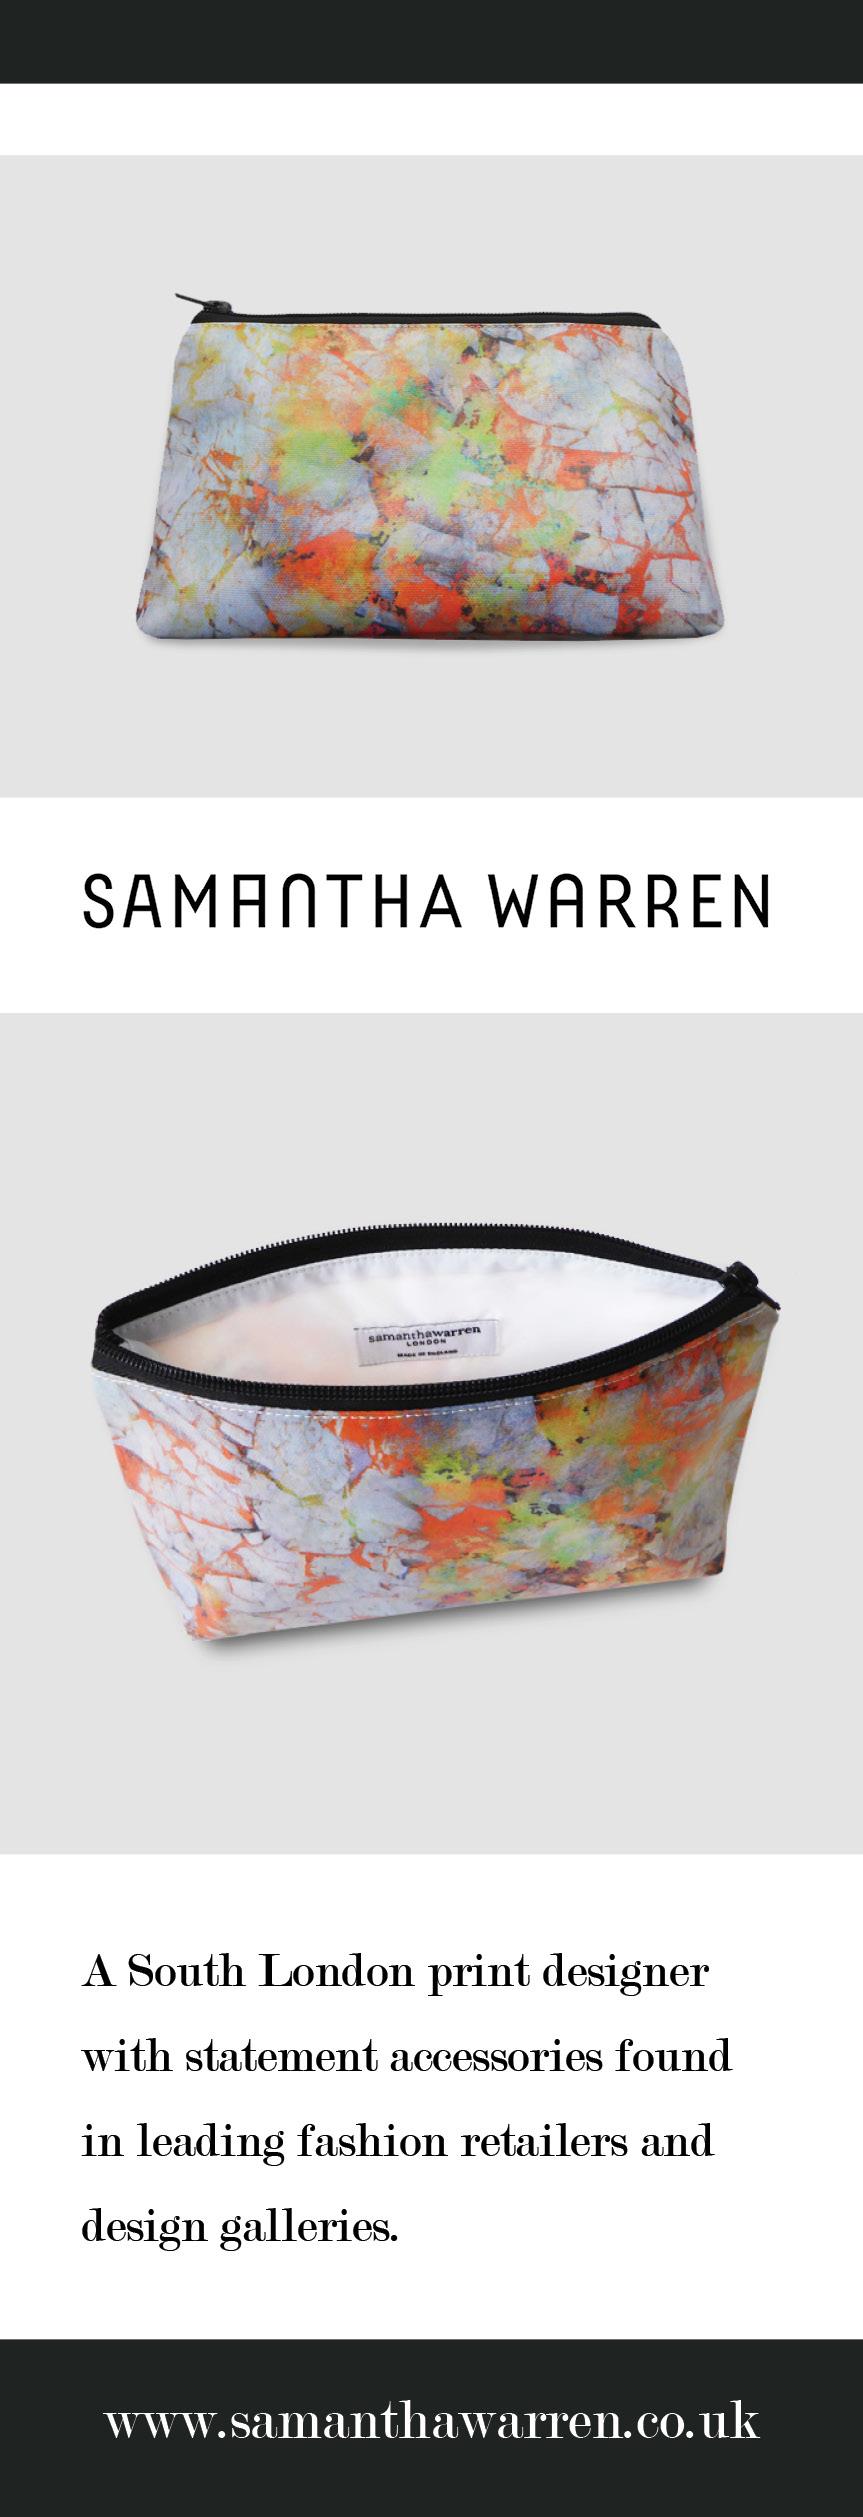 SamanthaWarren